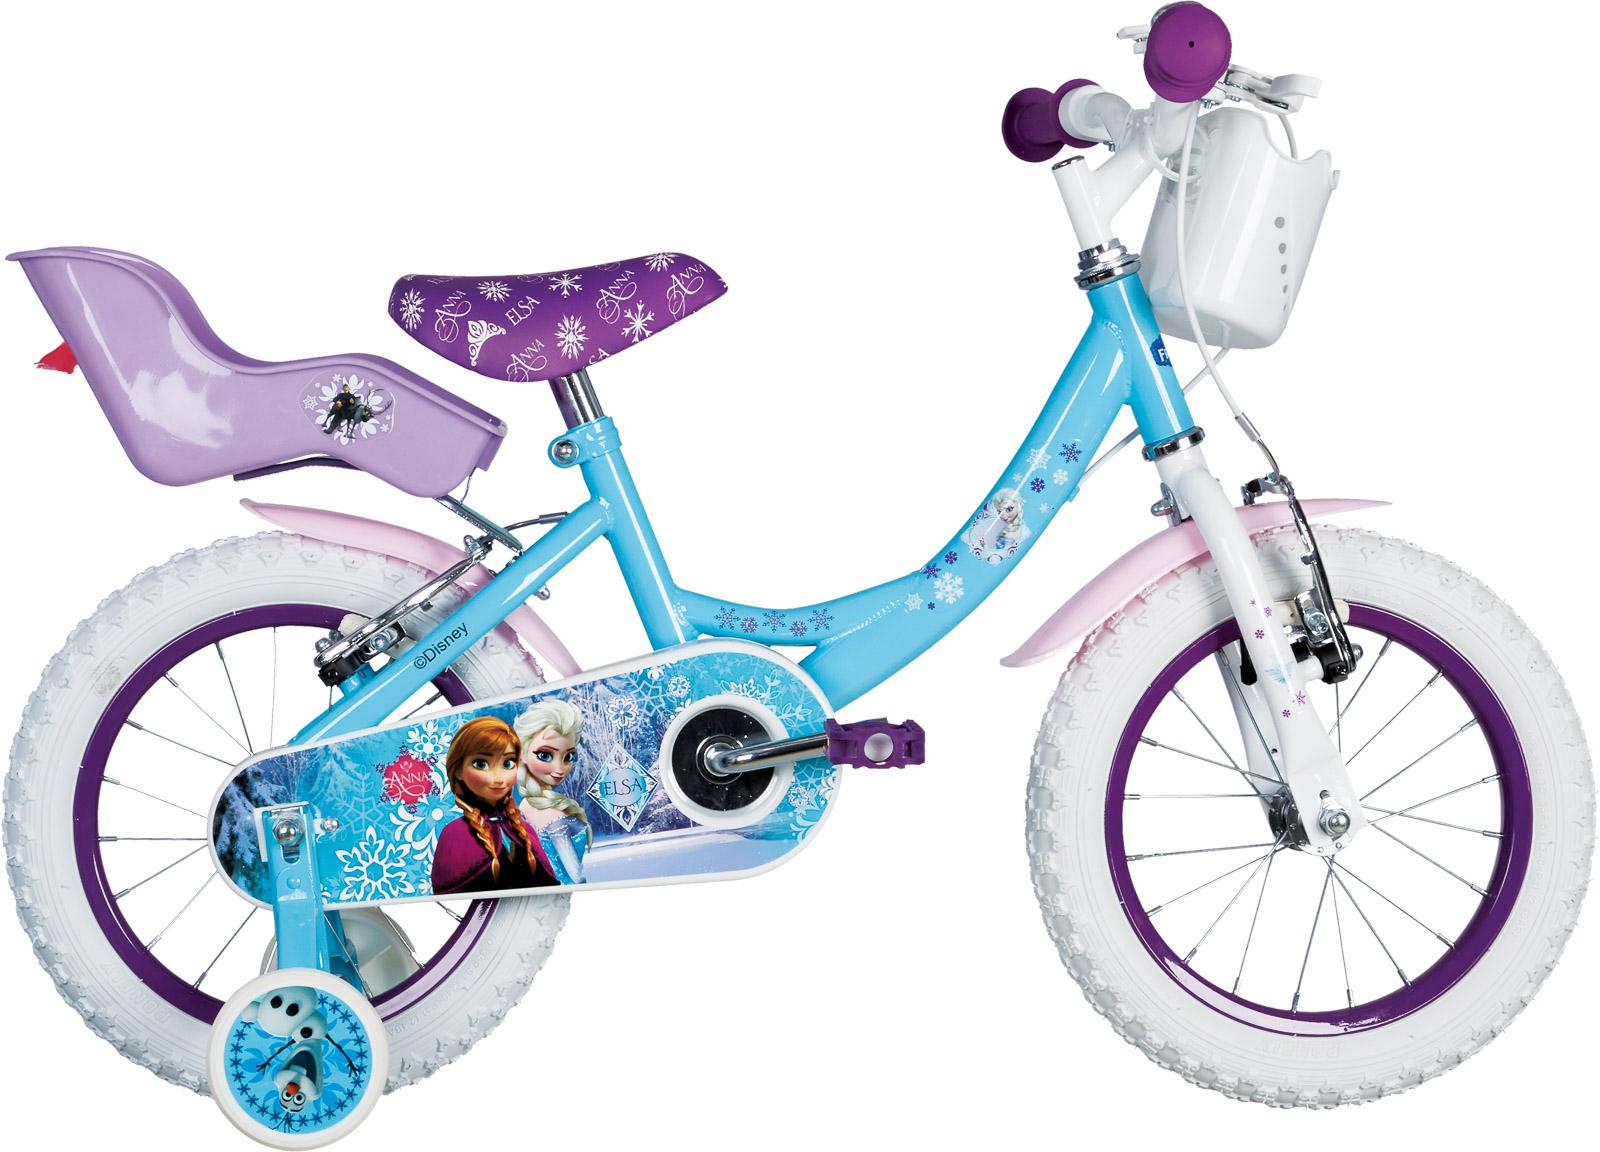 Frozen FROZEN 14, dječiji prsluk bicikl, plava